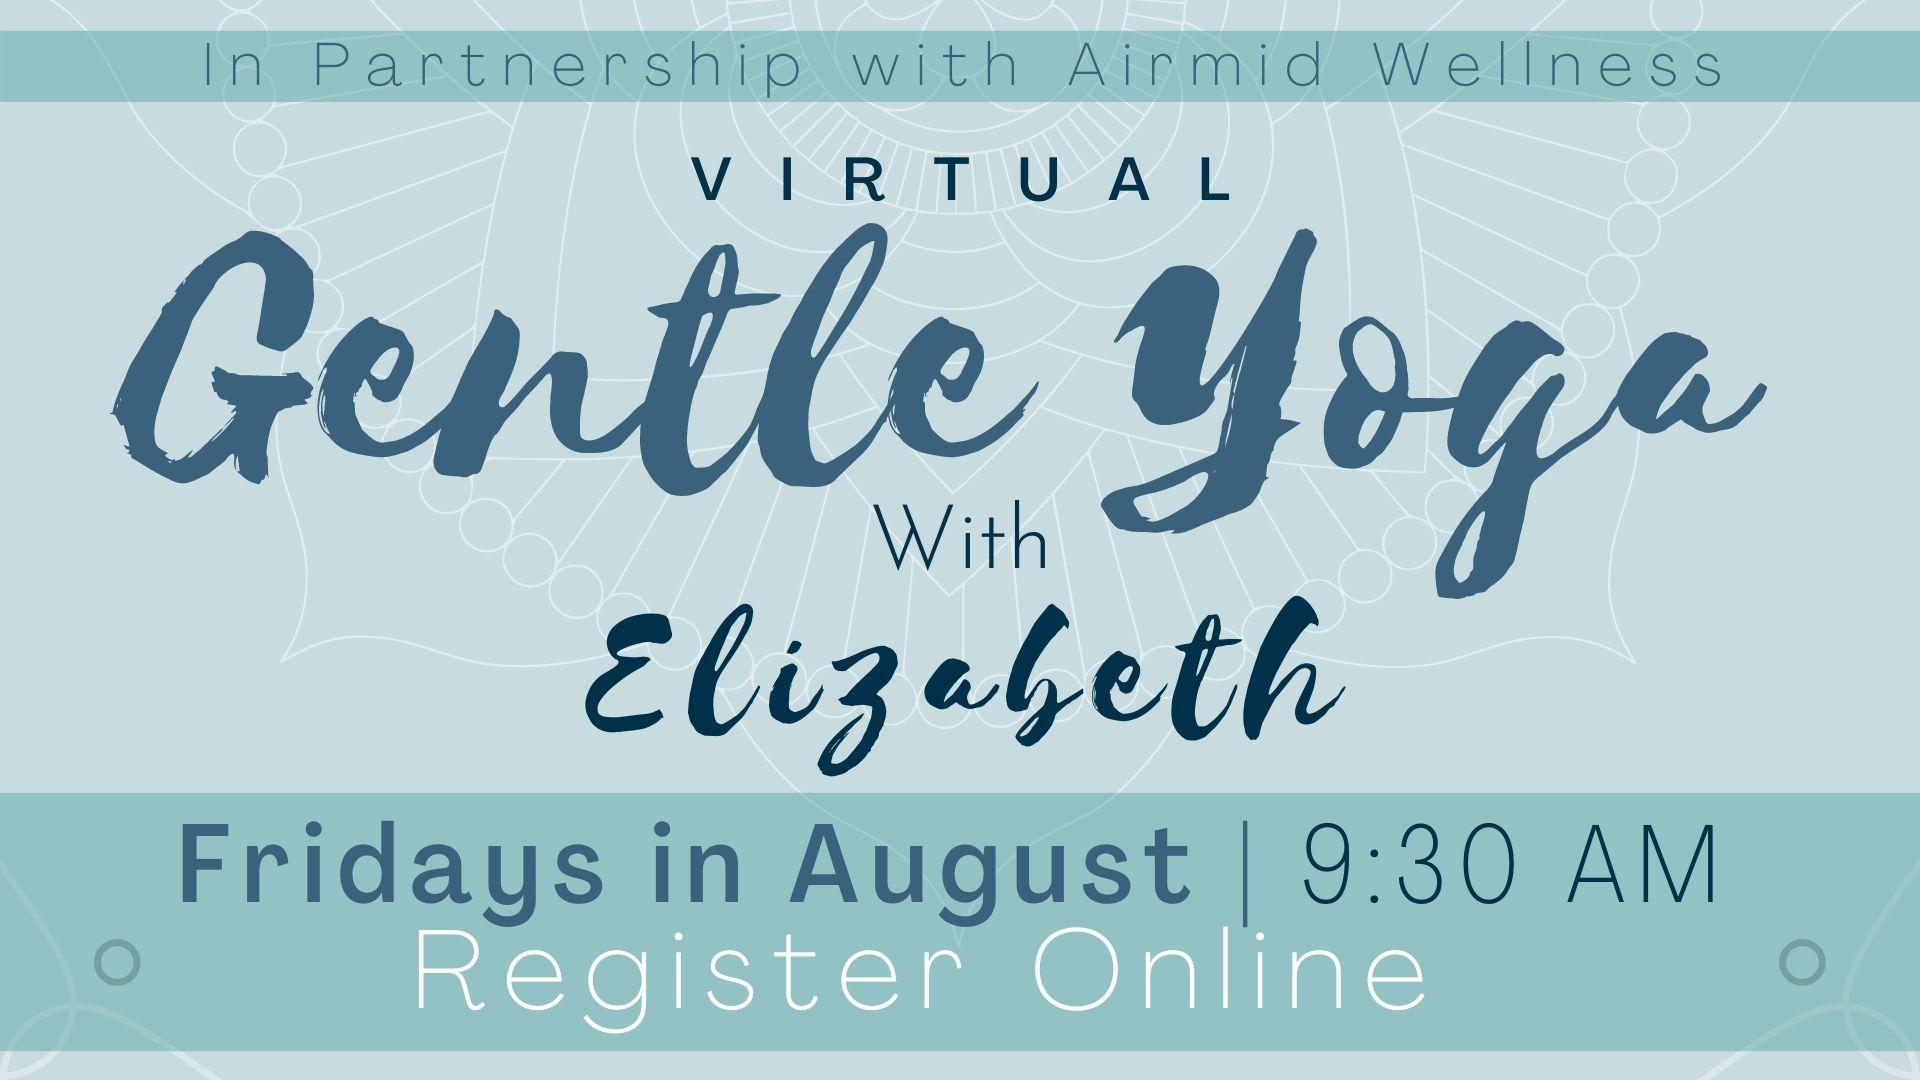 Virtual Gentle Yoga with Elizabeth